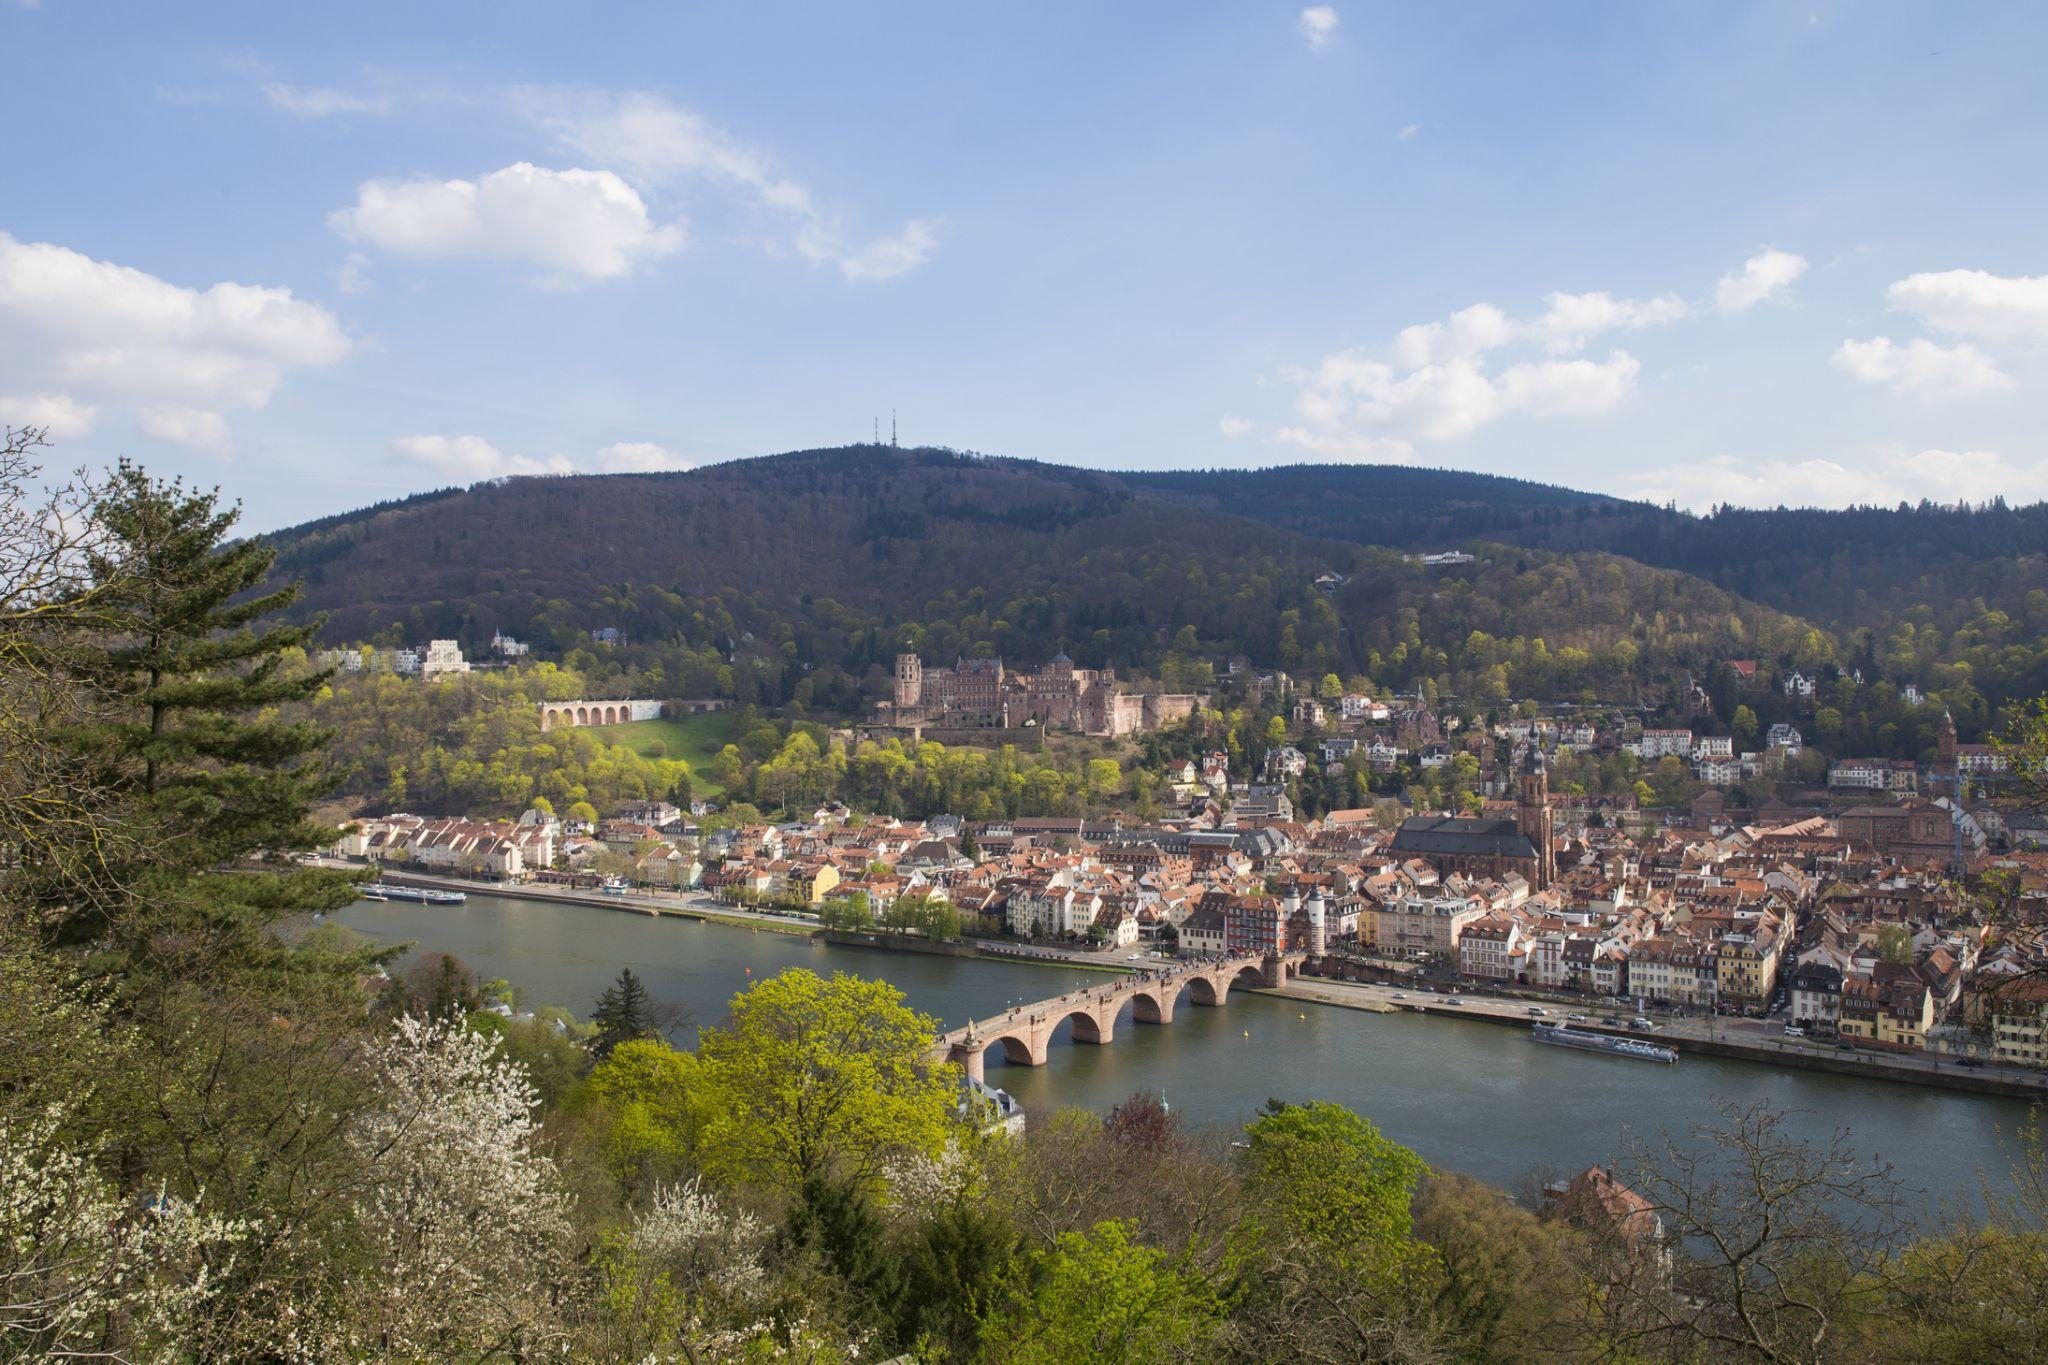 Heidelberg view from Philosophenweg, Germany